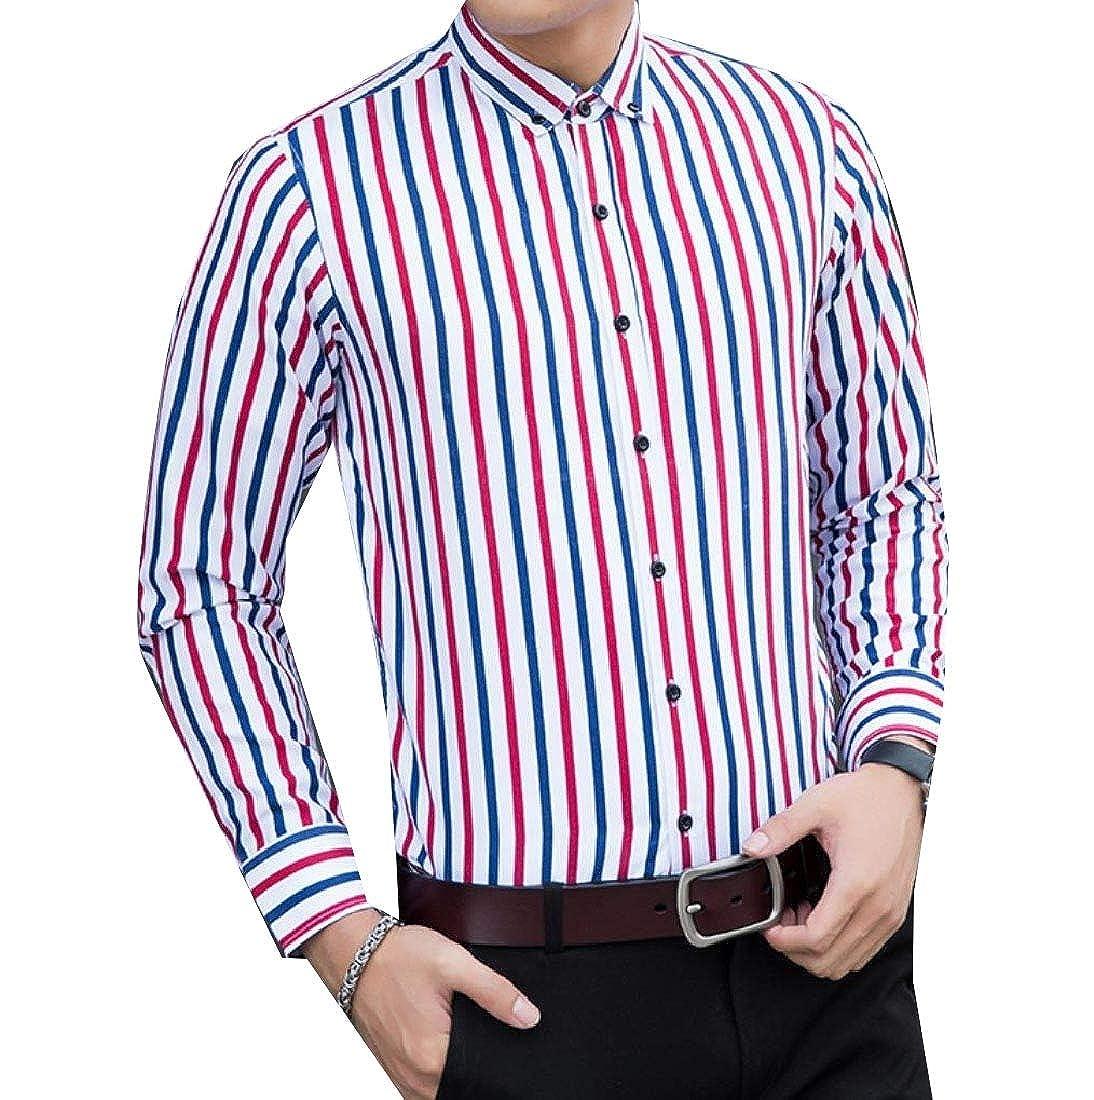 YUNY Men Button Striped Big and Tal Skinny Long-Sleeve Shirt Blouse Tops 1 4XL